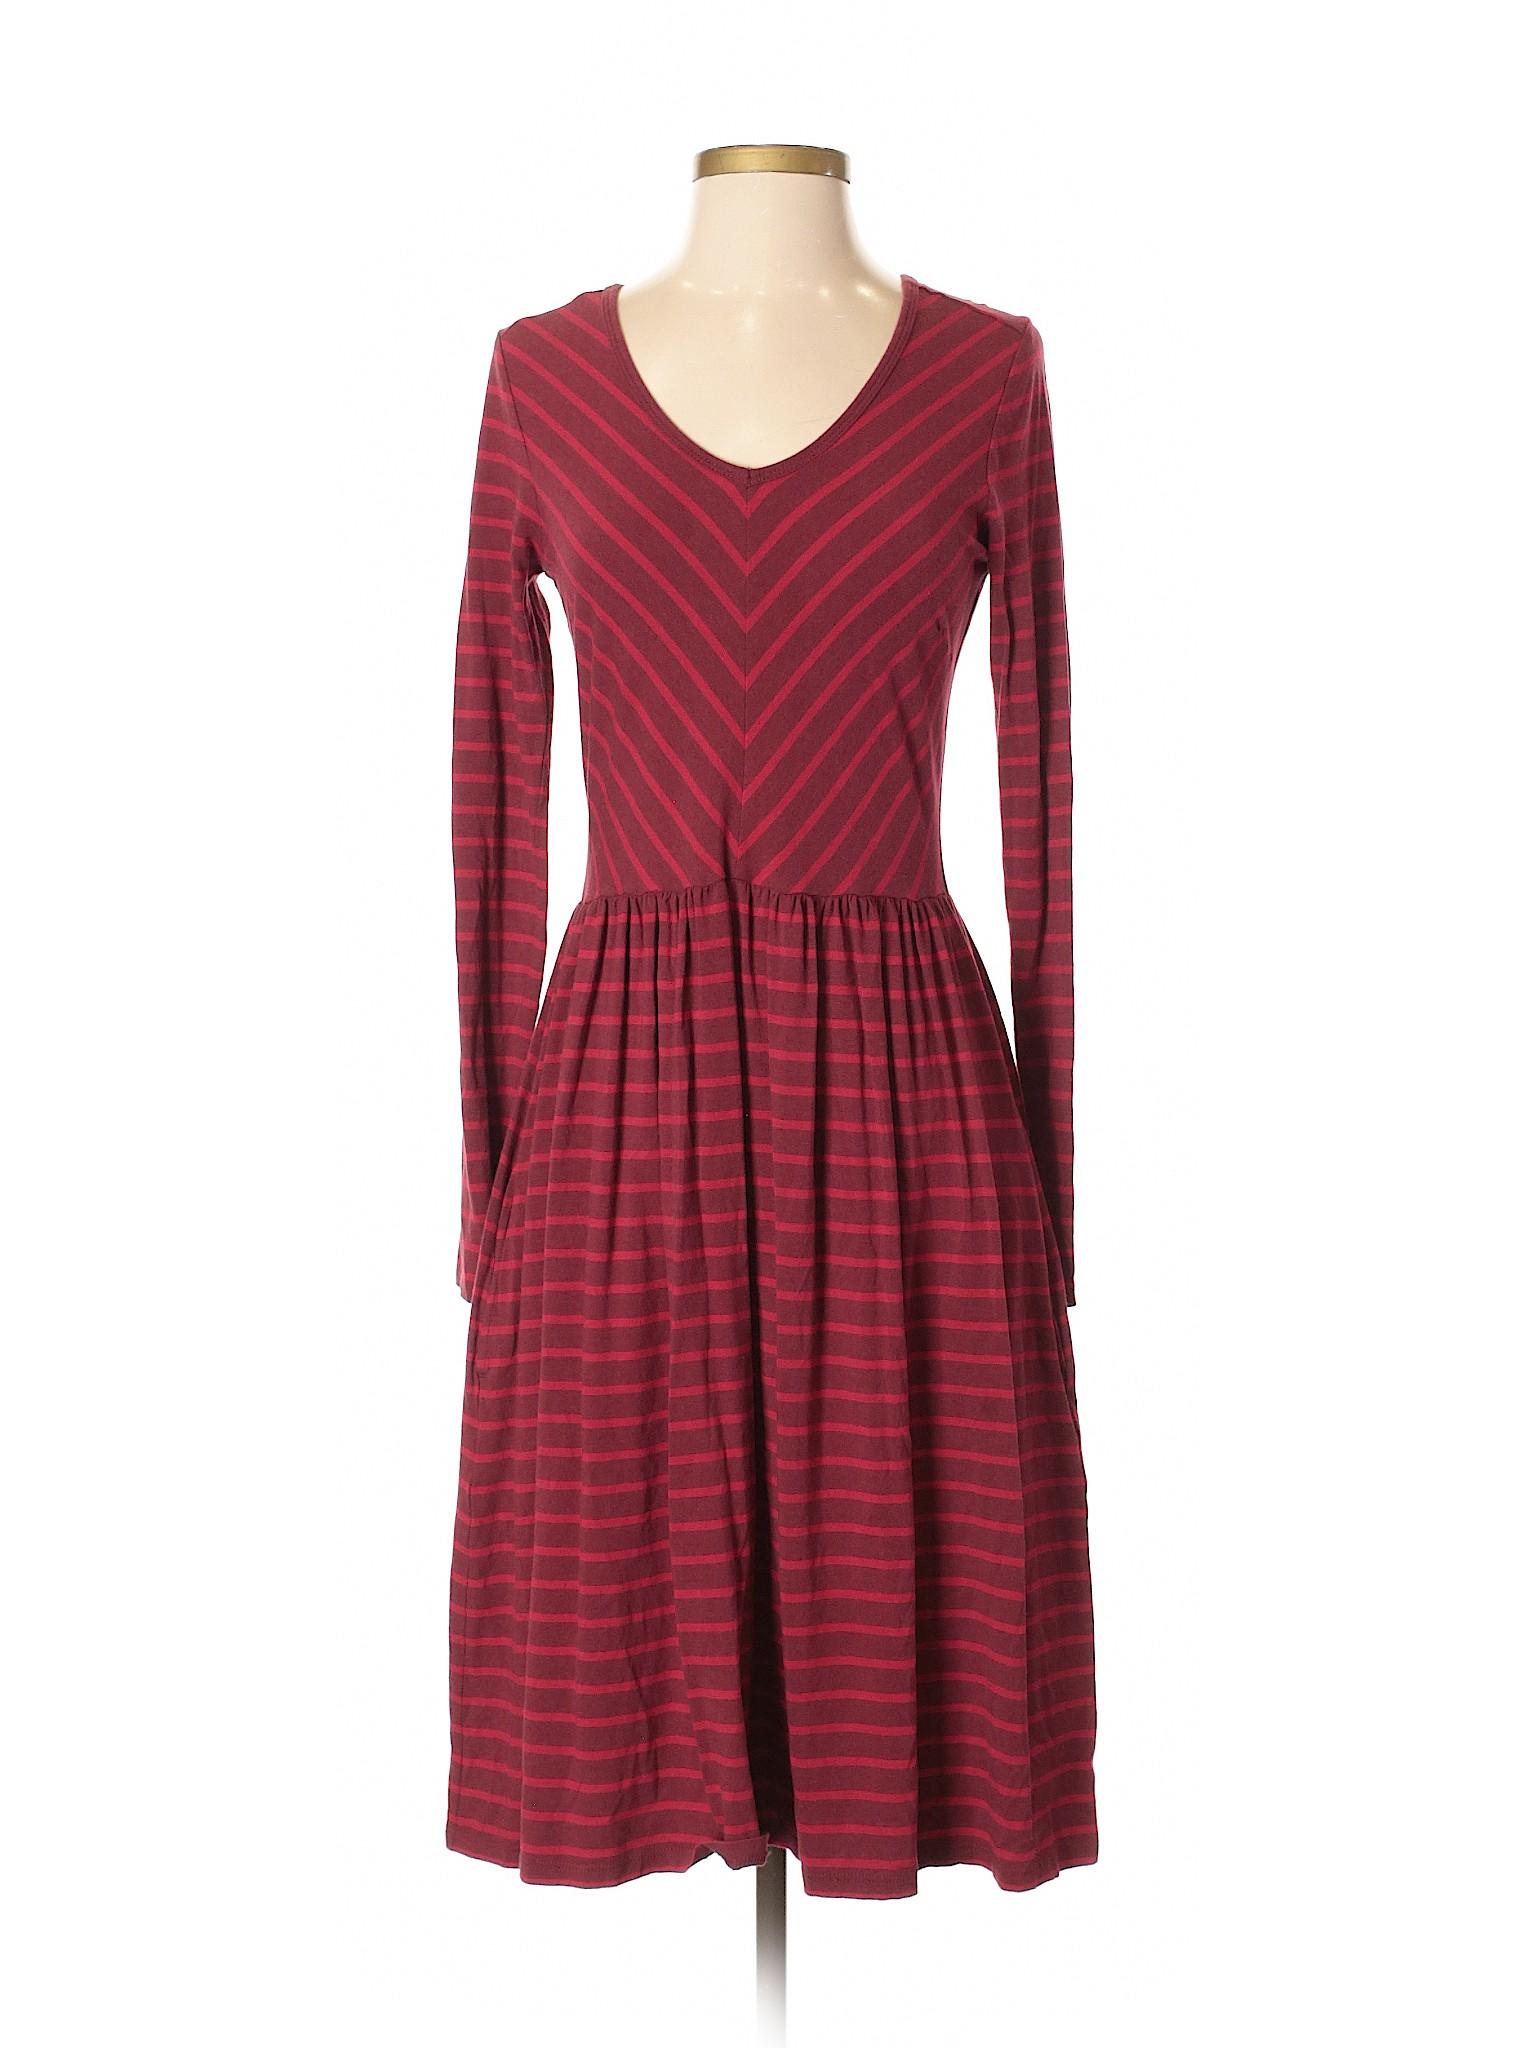 Dress Dress Casual Casual Selling Casual Hanna Selling Hanna Love Love Selling Dress Selling Love Hanna xwUA4p8x